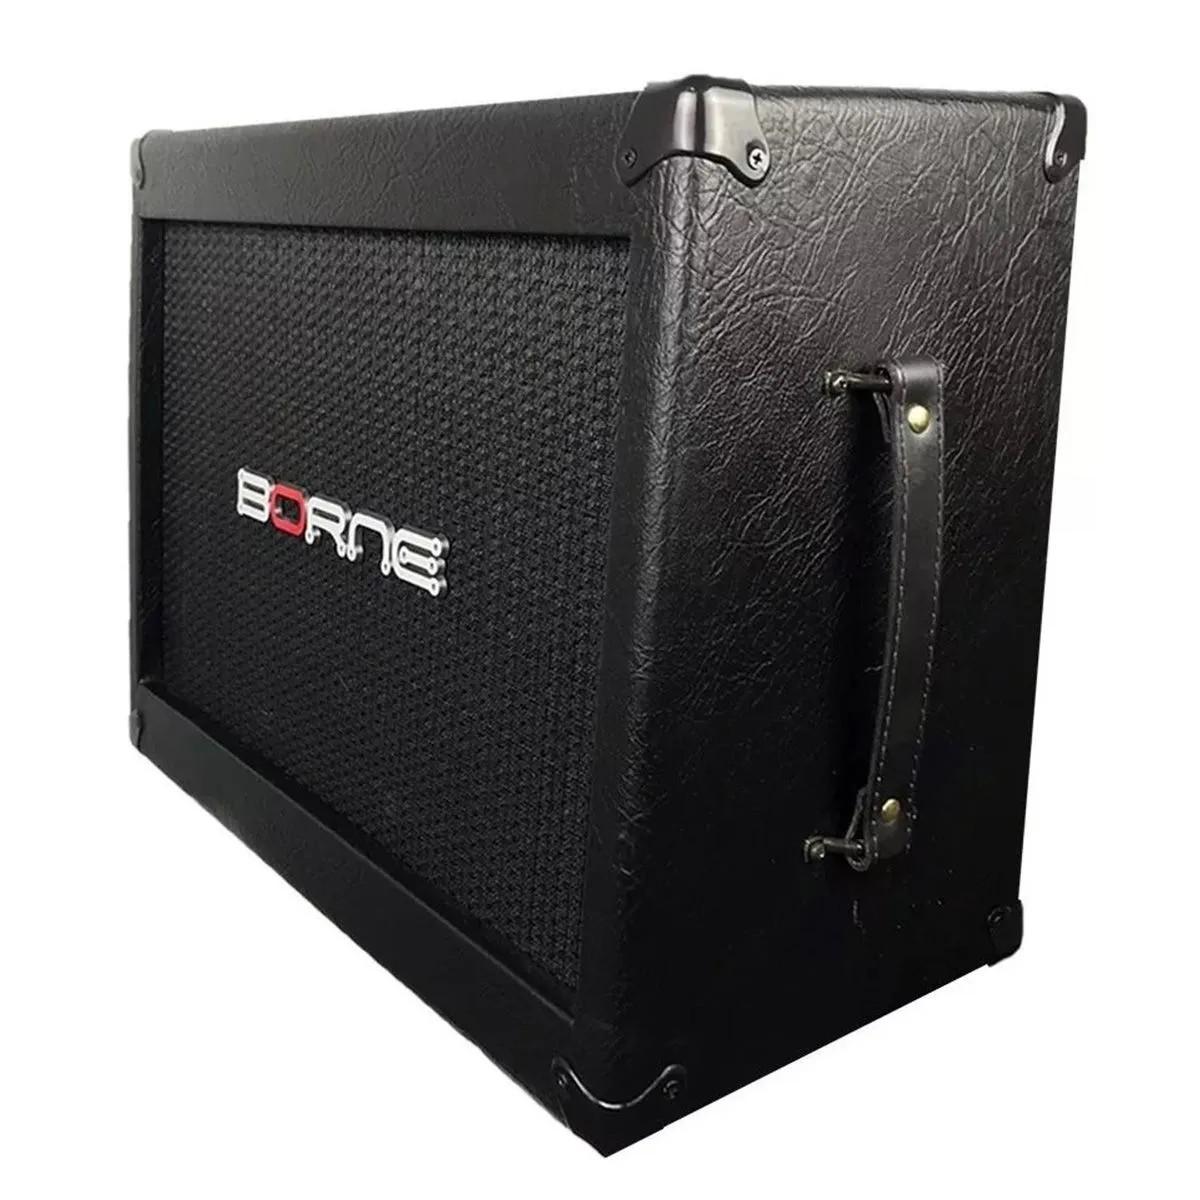 Gabinete Borne MOB 110 1x10 60W para Guitarra